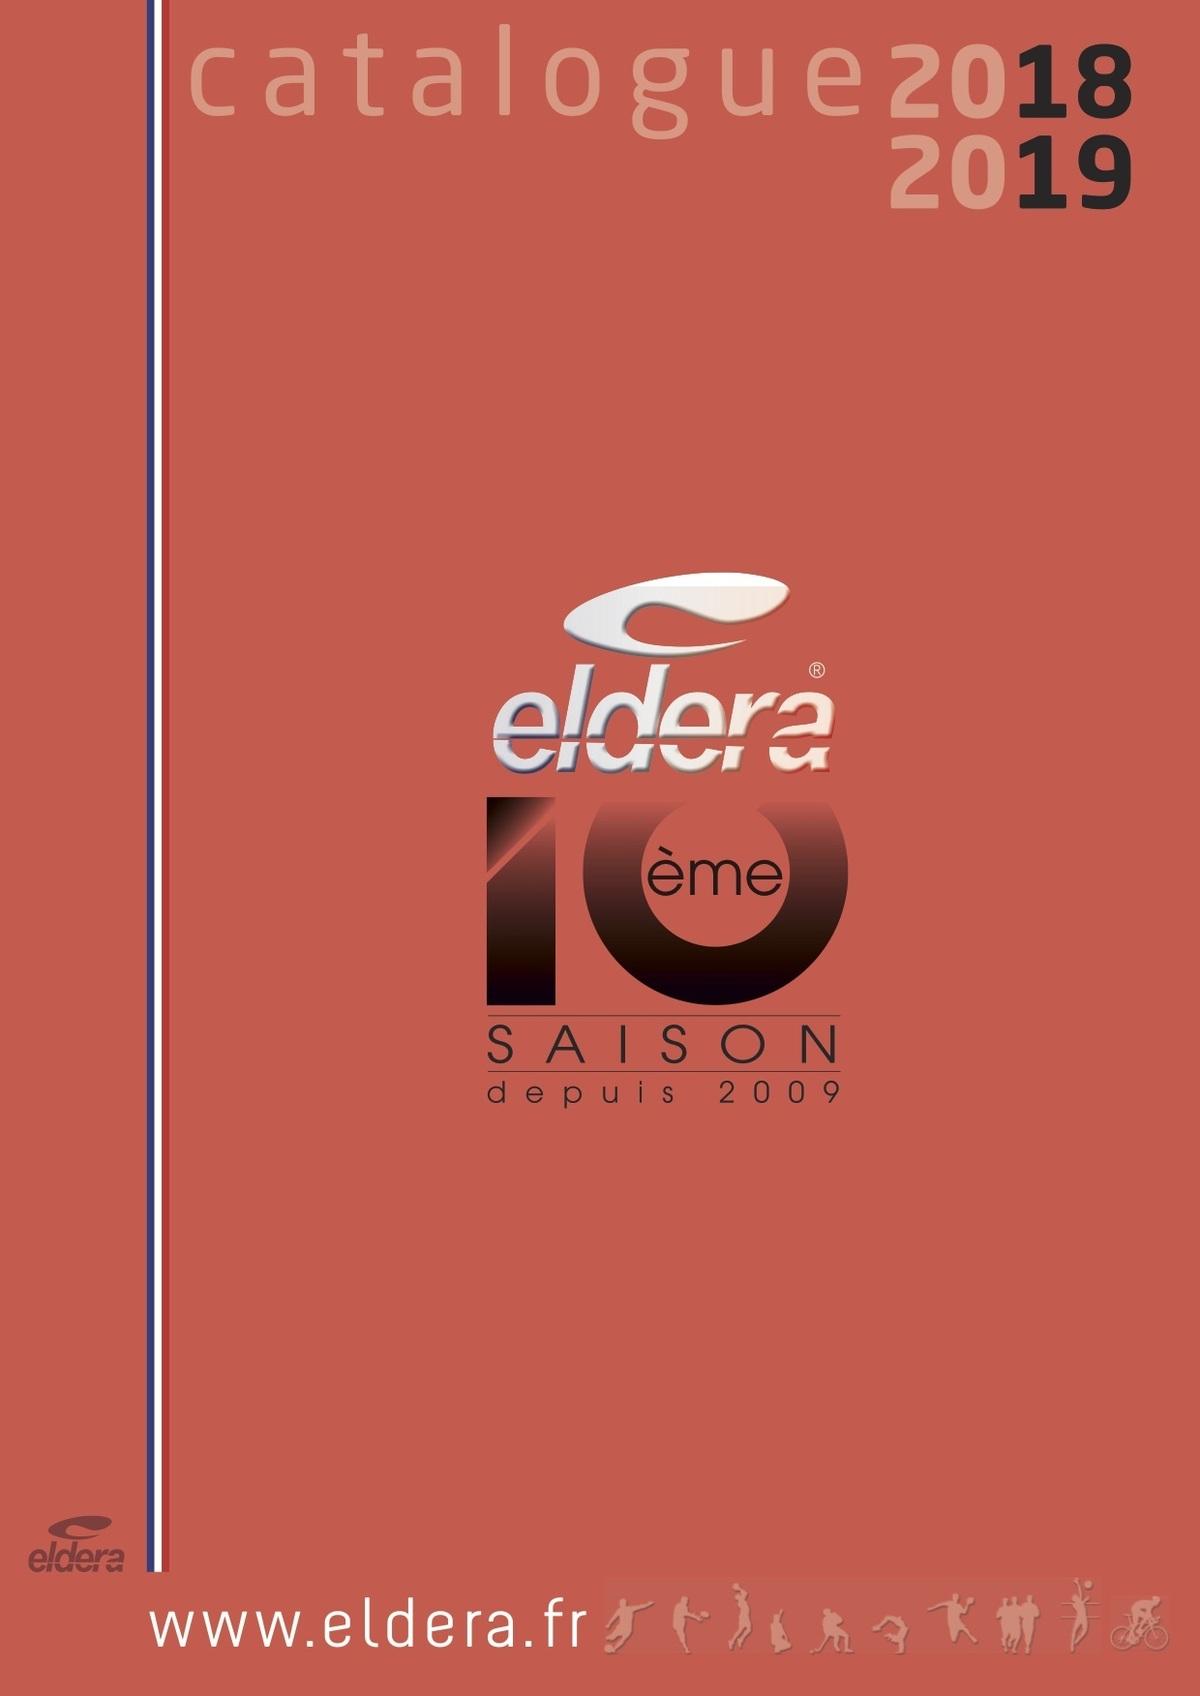 Image_eldera_-_pre_sentation--0-0--2bc5aa12-9860-4810-99b2-5a18c238beff